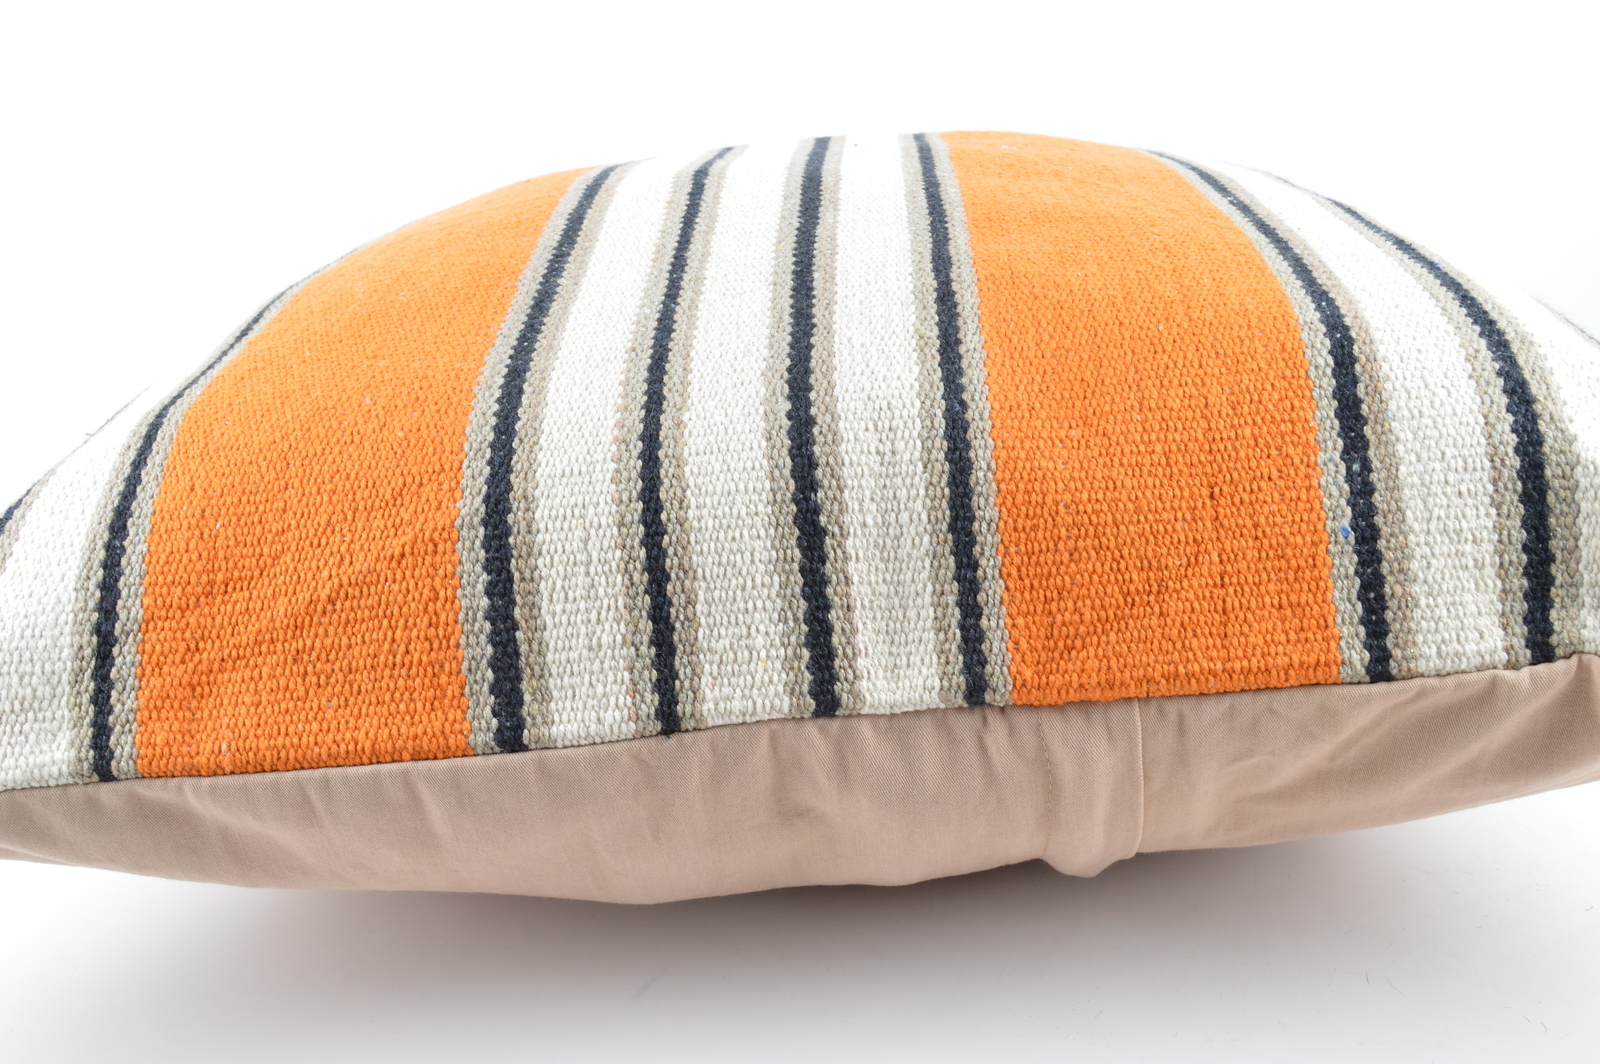 Big Throw Pillow Covers : 24x24 large kilim pillow big pillow decorative pillow cover large cushion case - Decorative ...